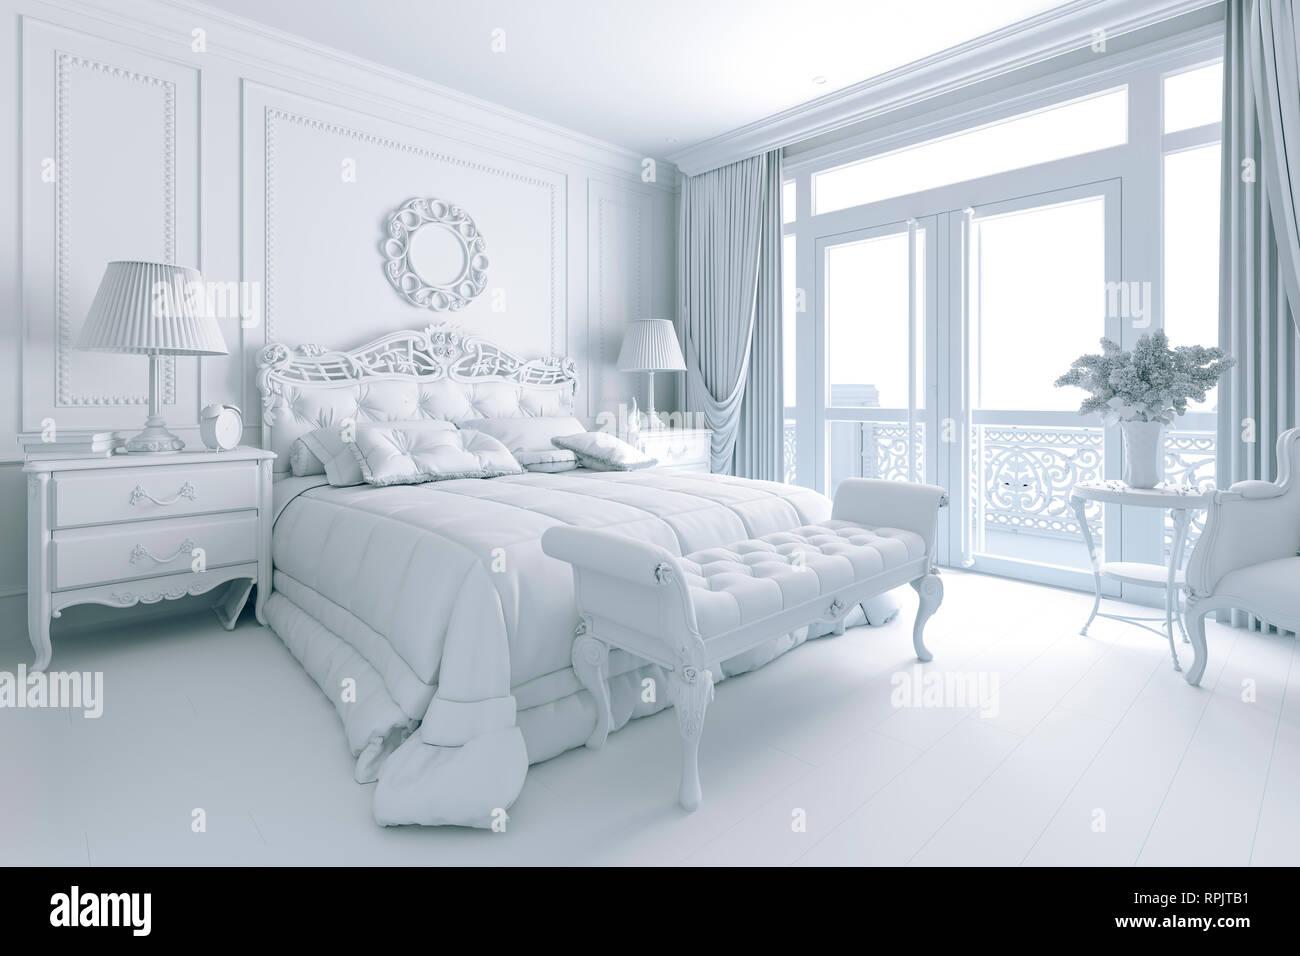 3d Render Of Beautiful Classic Bedroom Interior Stock Photo Alamy